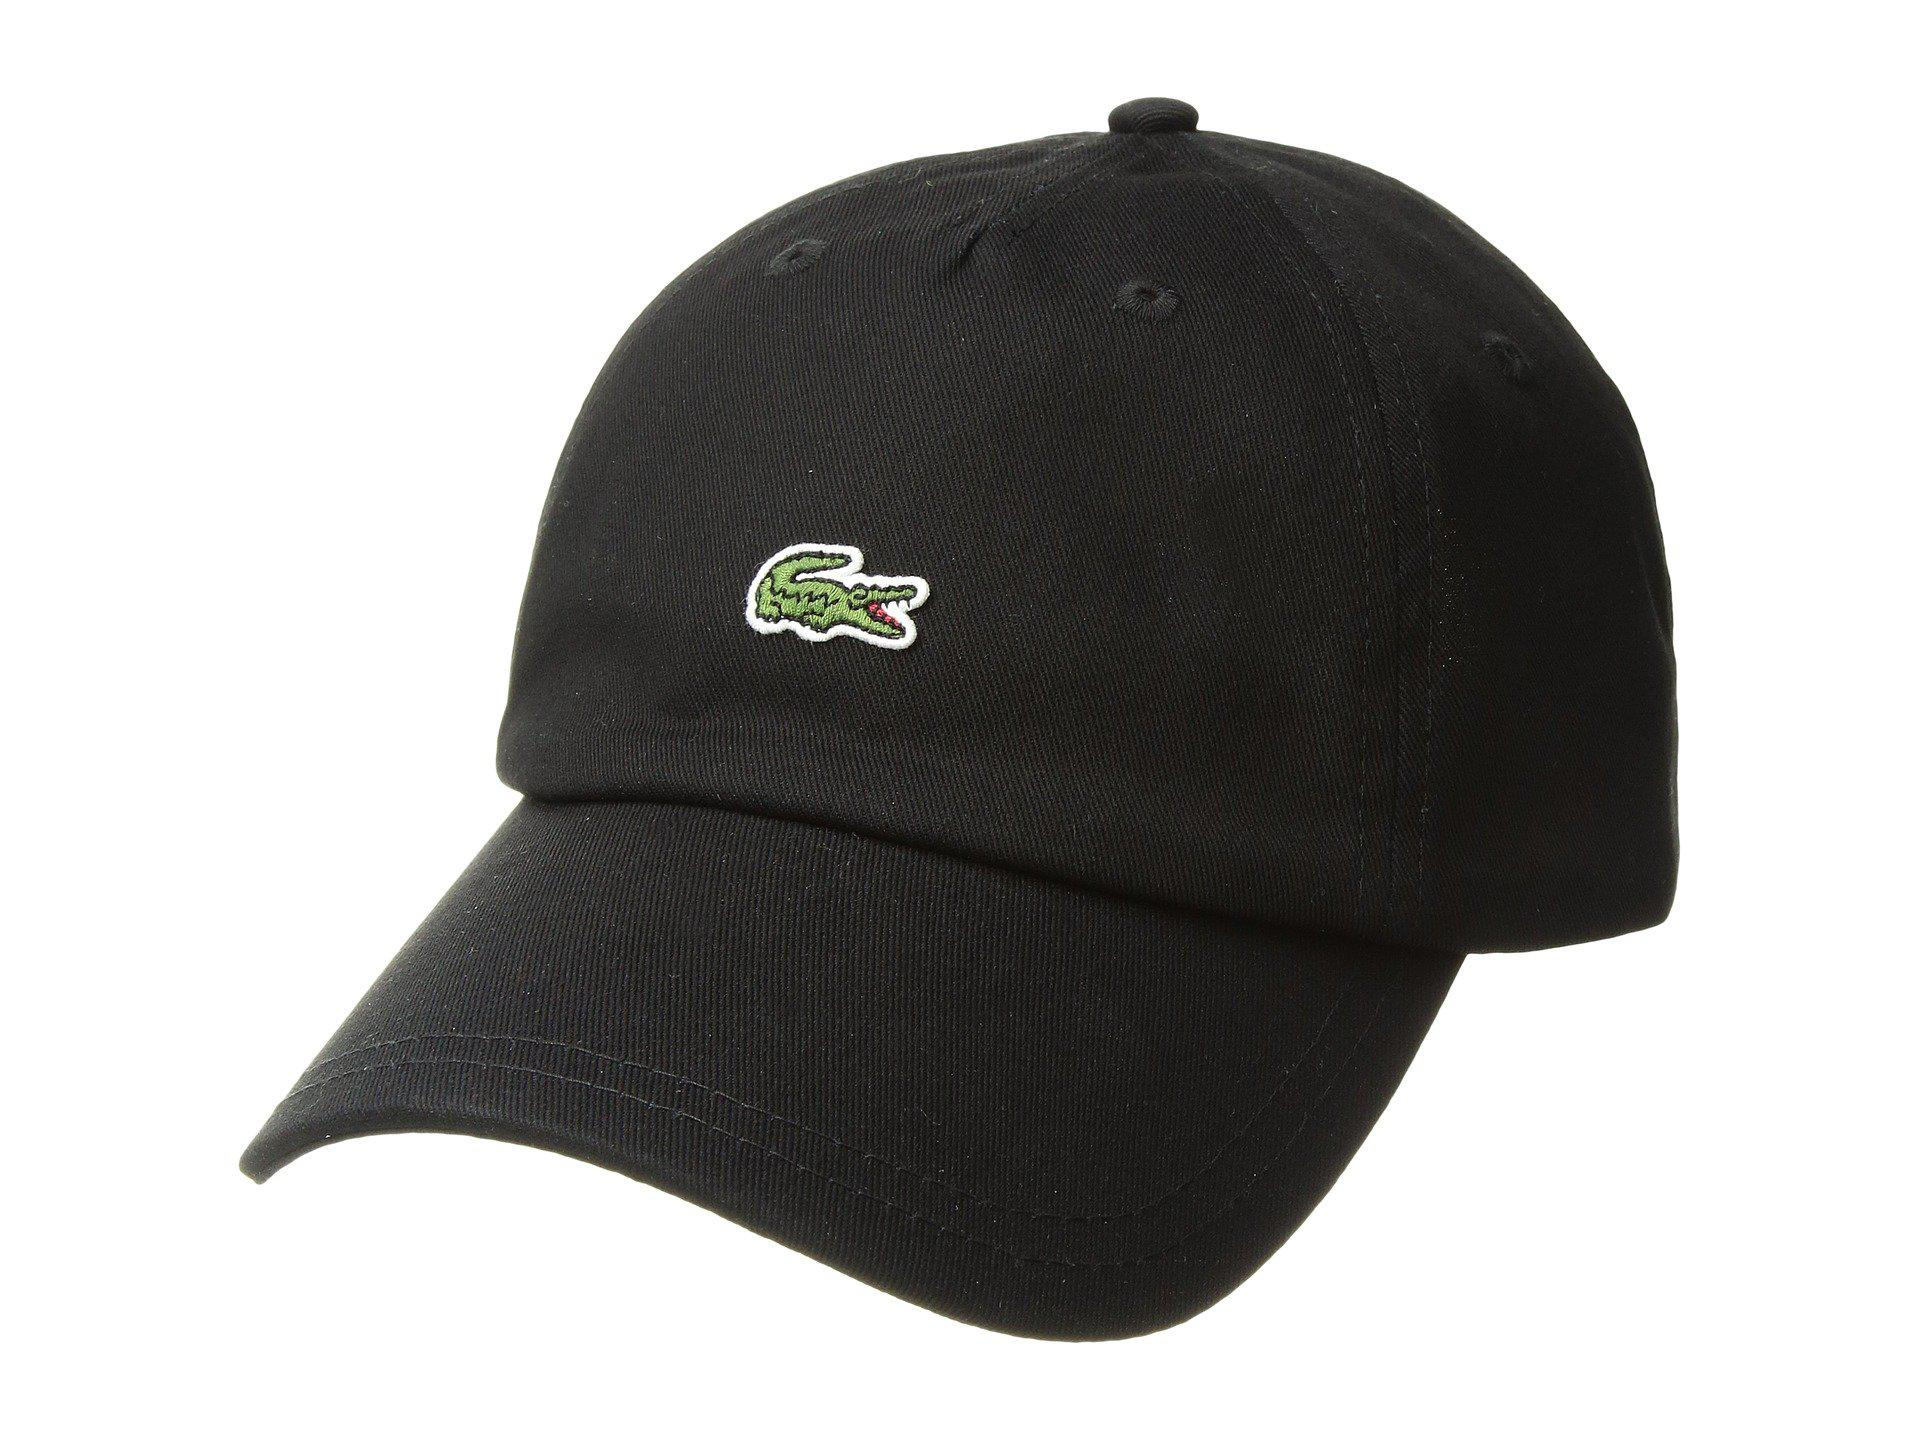 b4bb142a835 Lyst - Lacoste  small Croc  Strapback Cap in Black for Men